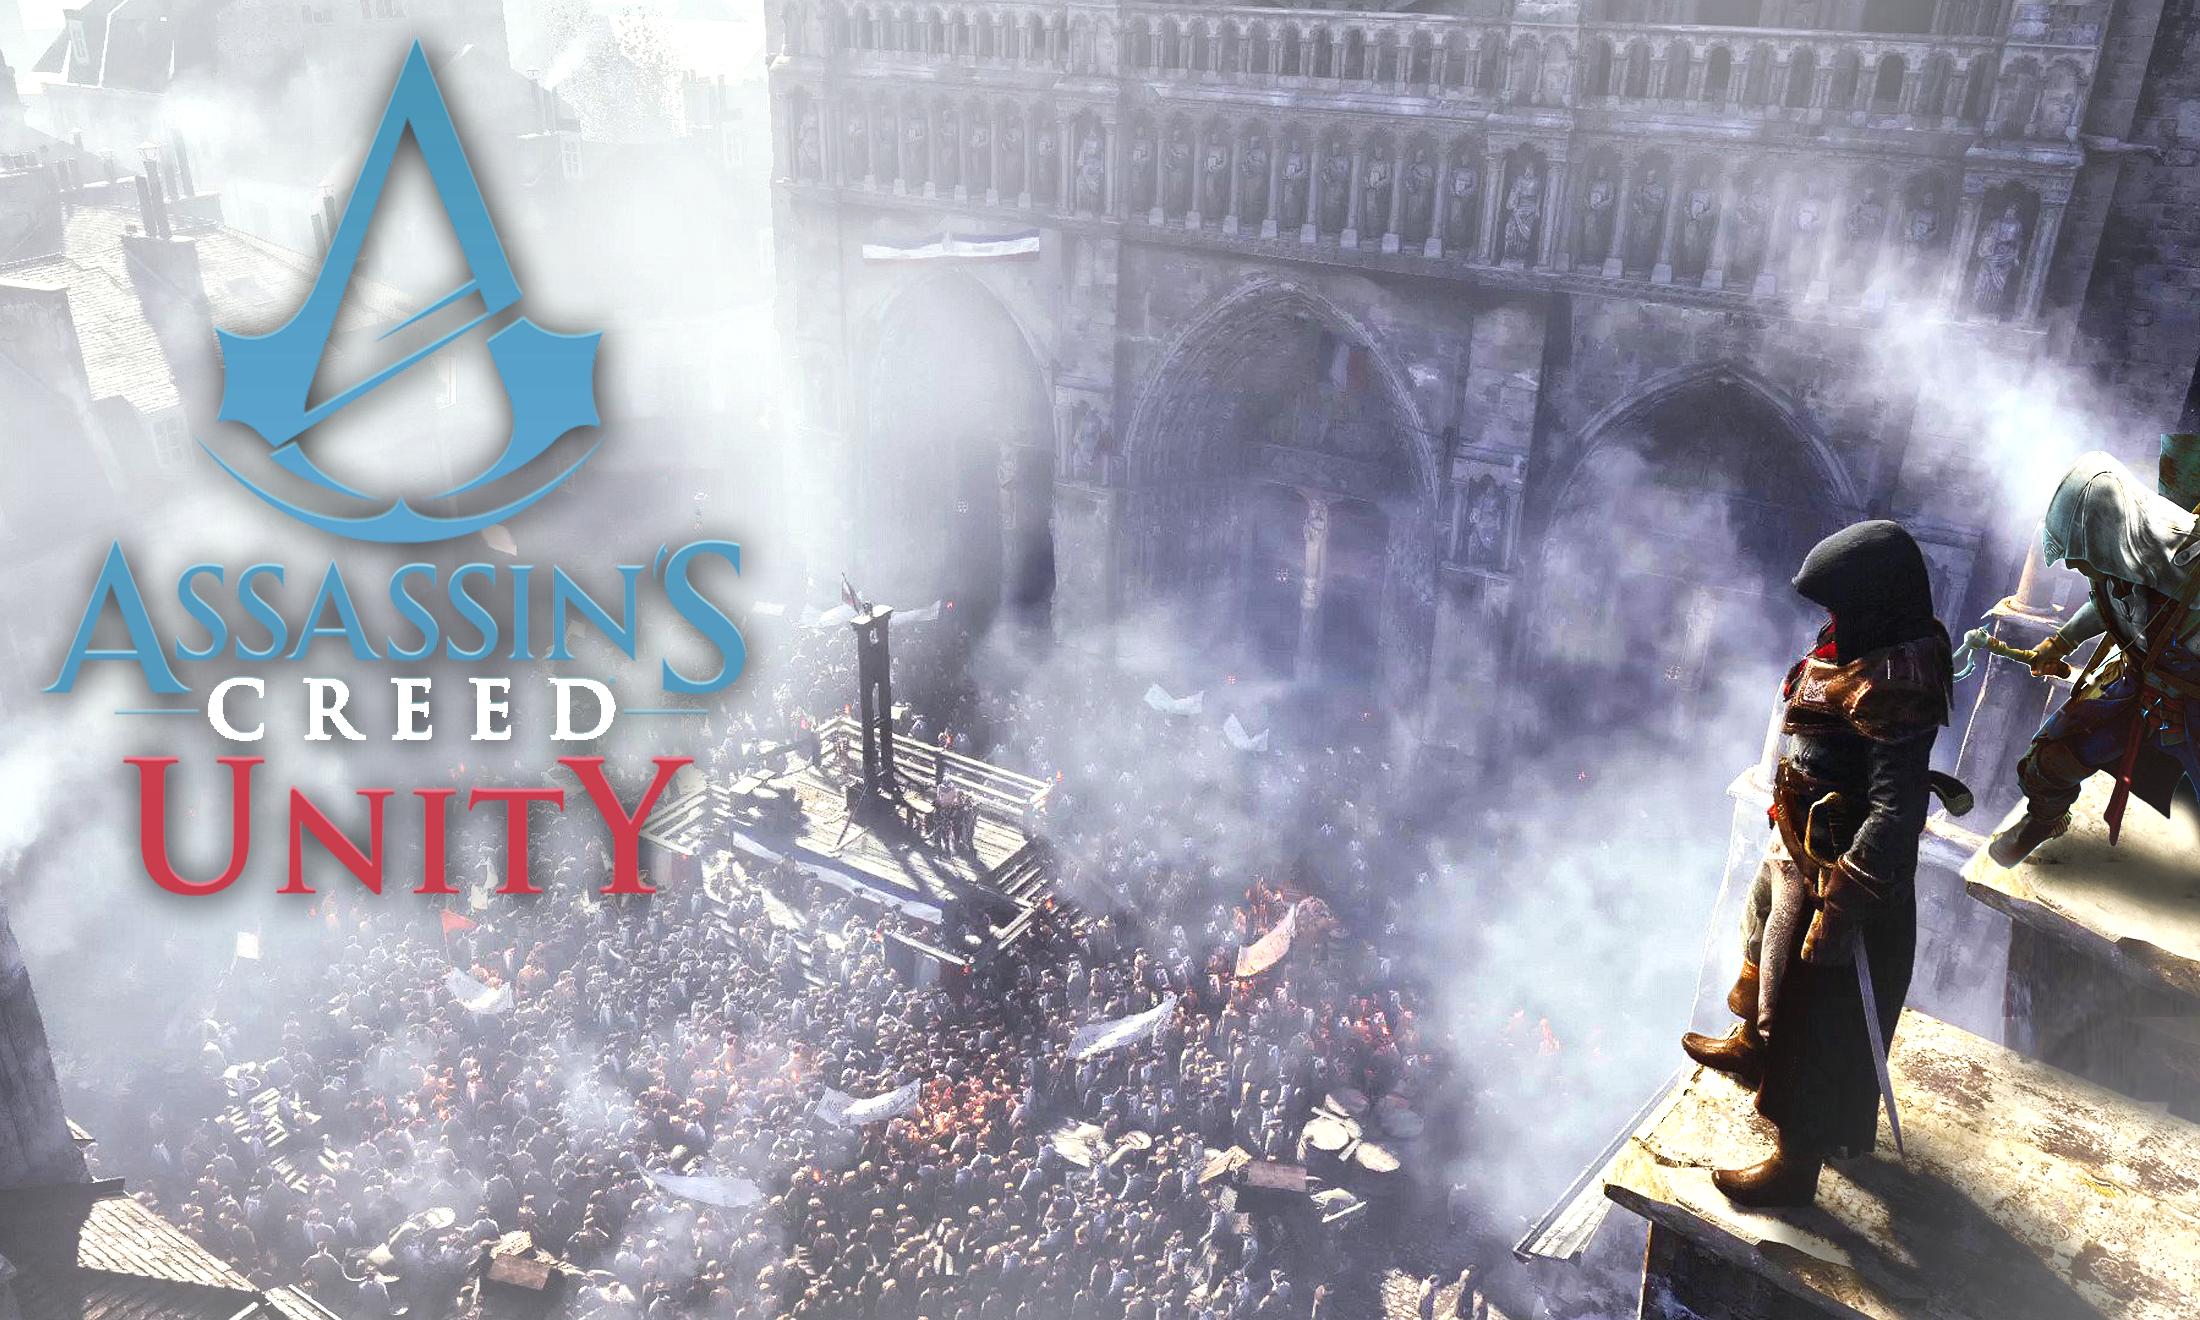 Fc09deviantart Fs70 F 2014 104 5 D Assassins Creed Unity Wallpaper By Bucksfan5 D7eh4dv